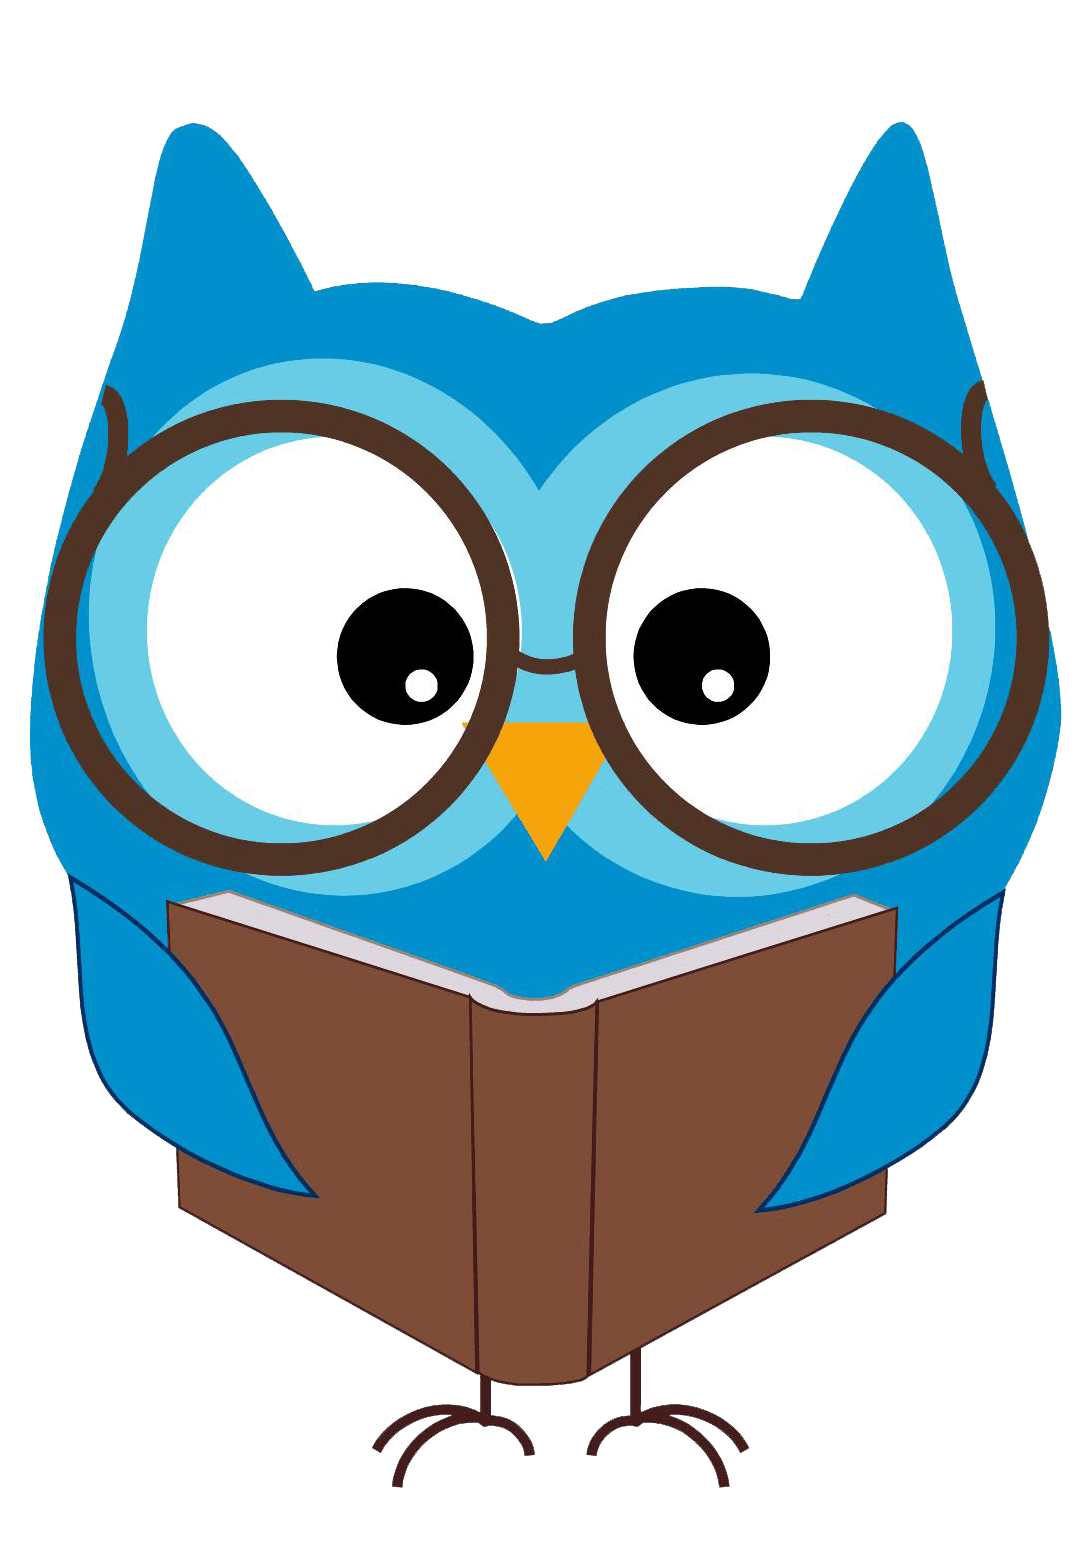 Pumpkin owl clipart jpg free download History Owl Cliparts - Cliparts Zone jpg free download